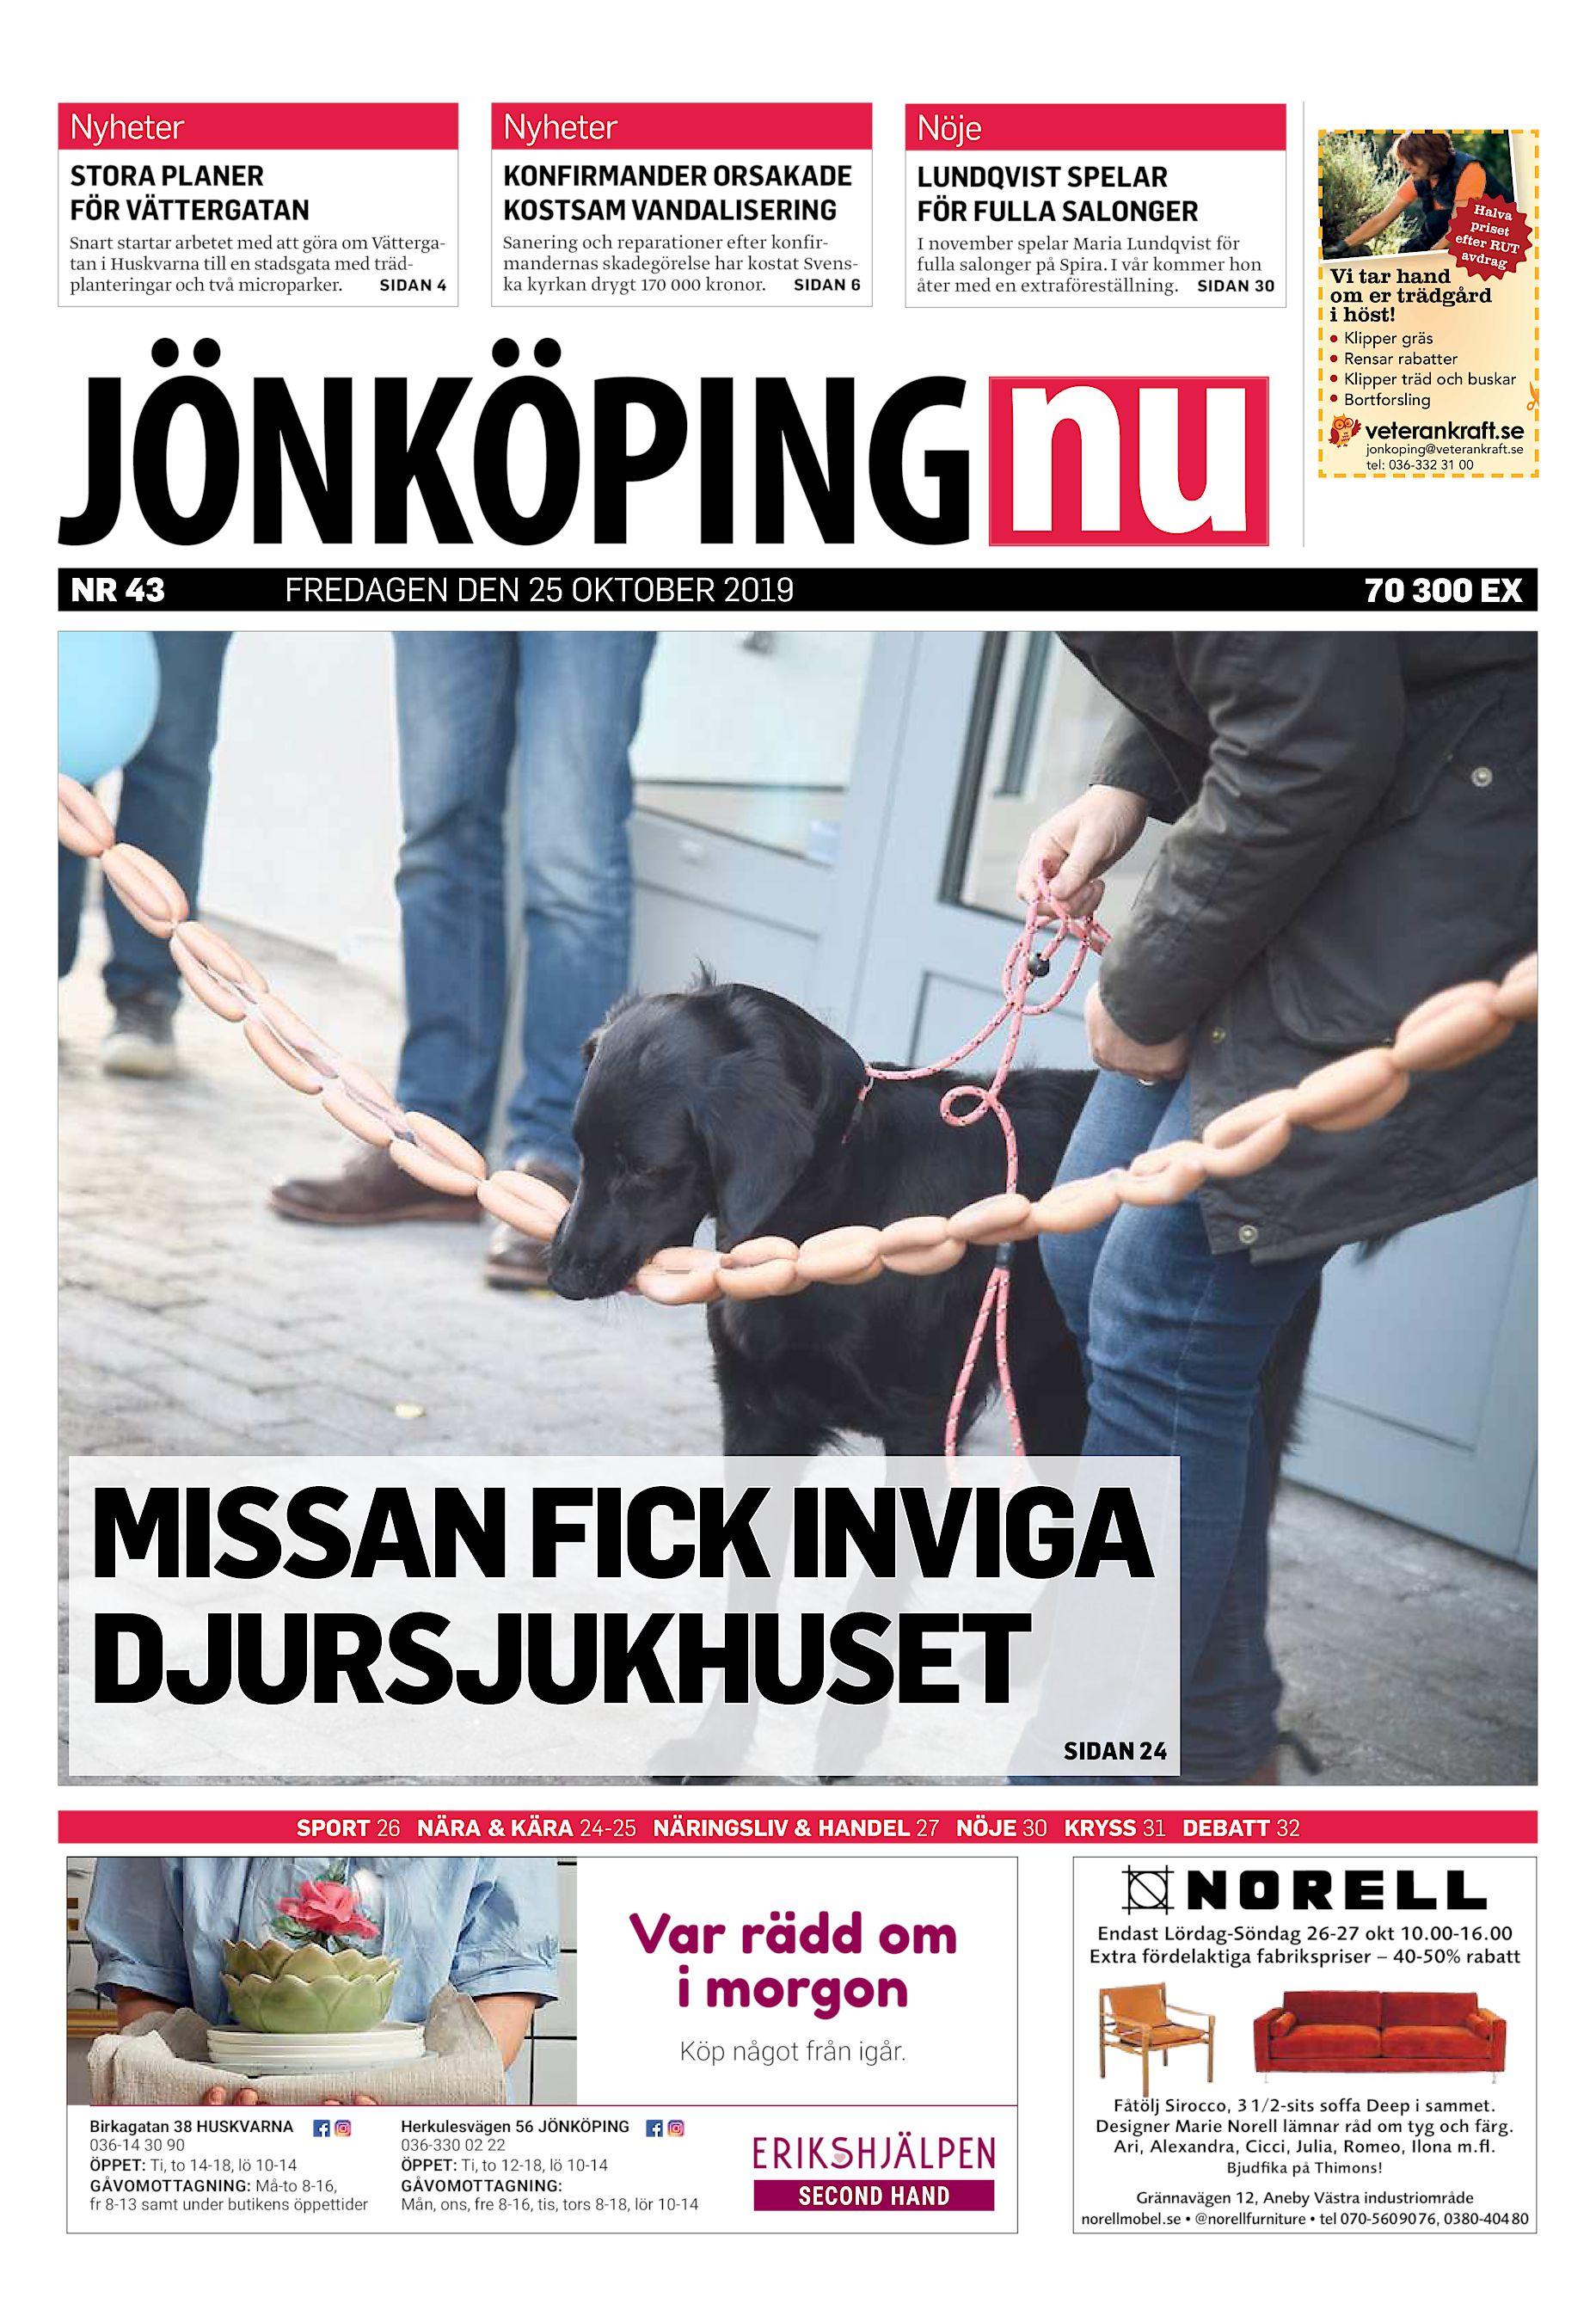 Sofia Joakimson, Baronvgen 117, Jnkping | unam.net